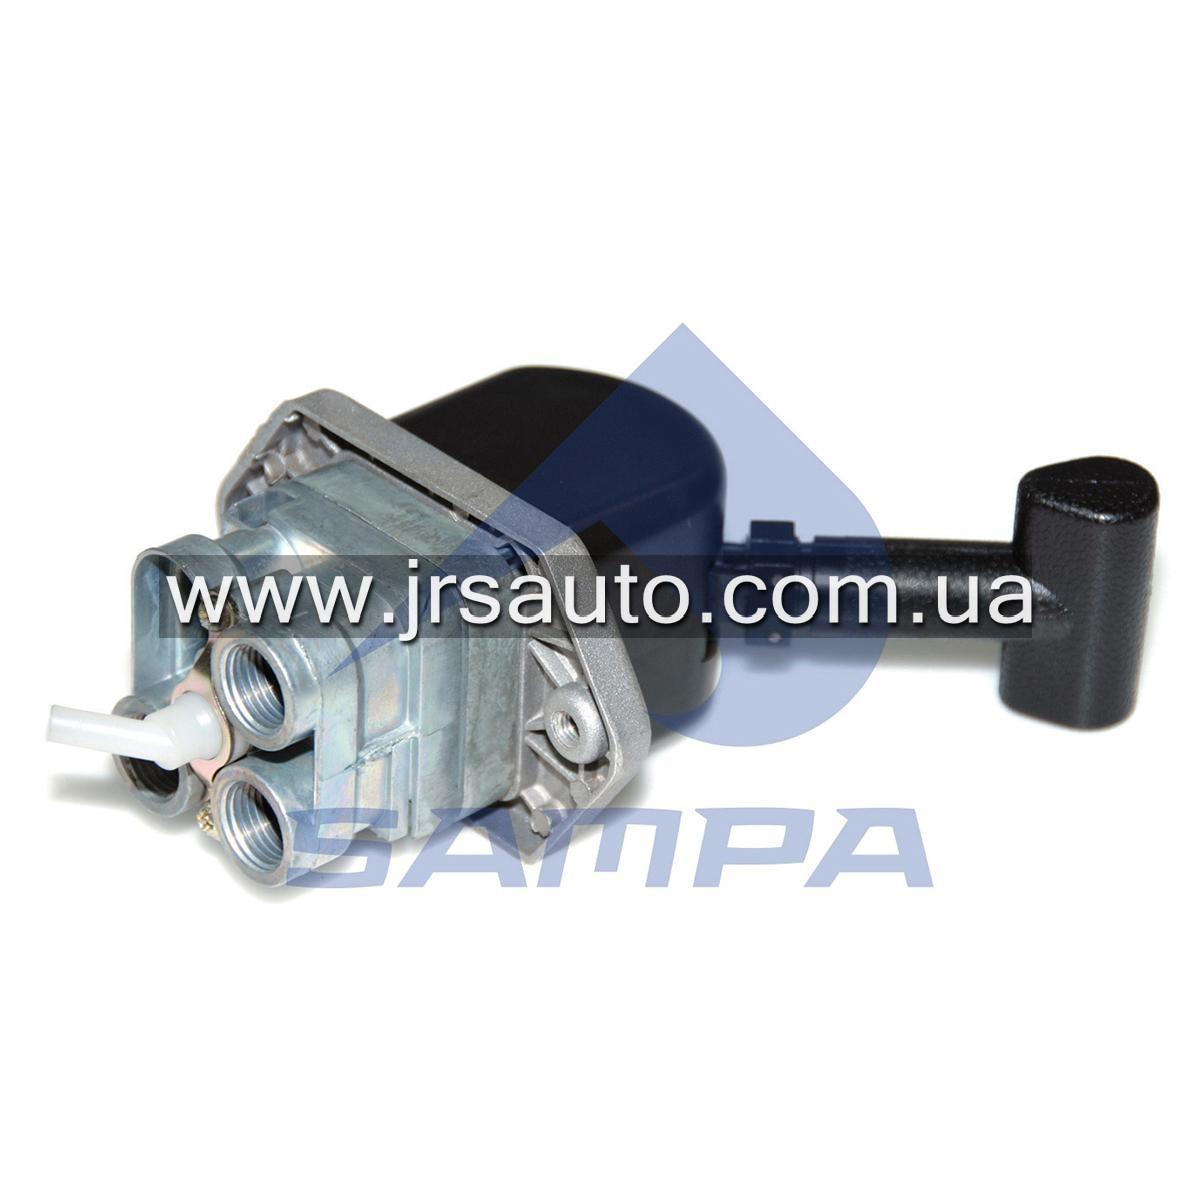 Тормозной клапан, стояночный тормоз \9617232150 \ 093.214